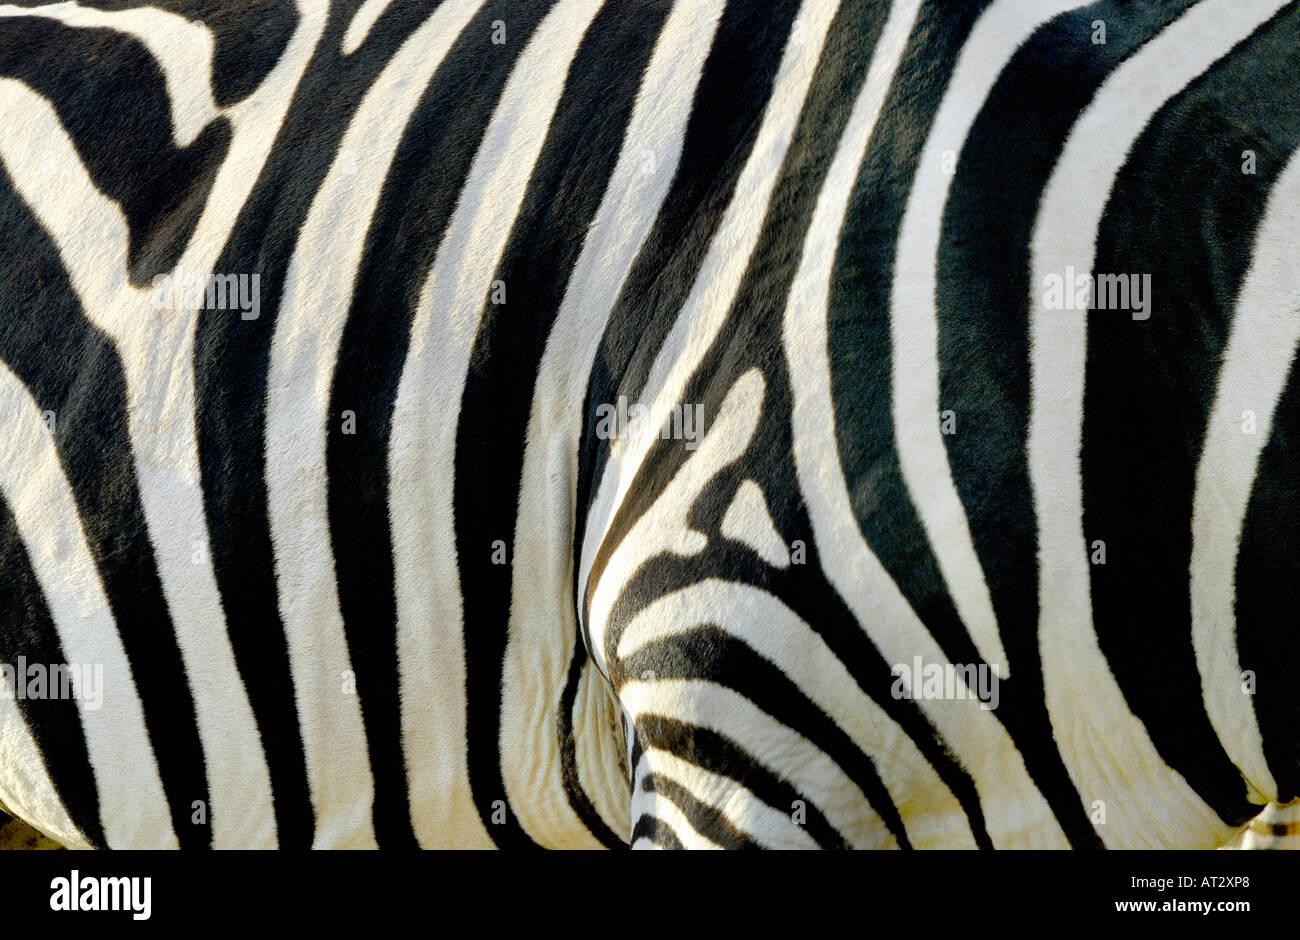 ZEBRA STRIPES PATTERN - Stock Image